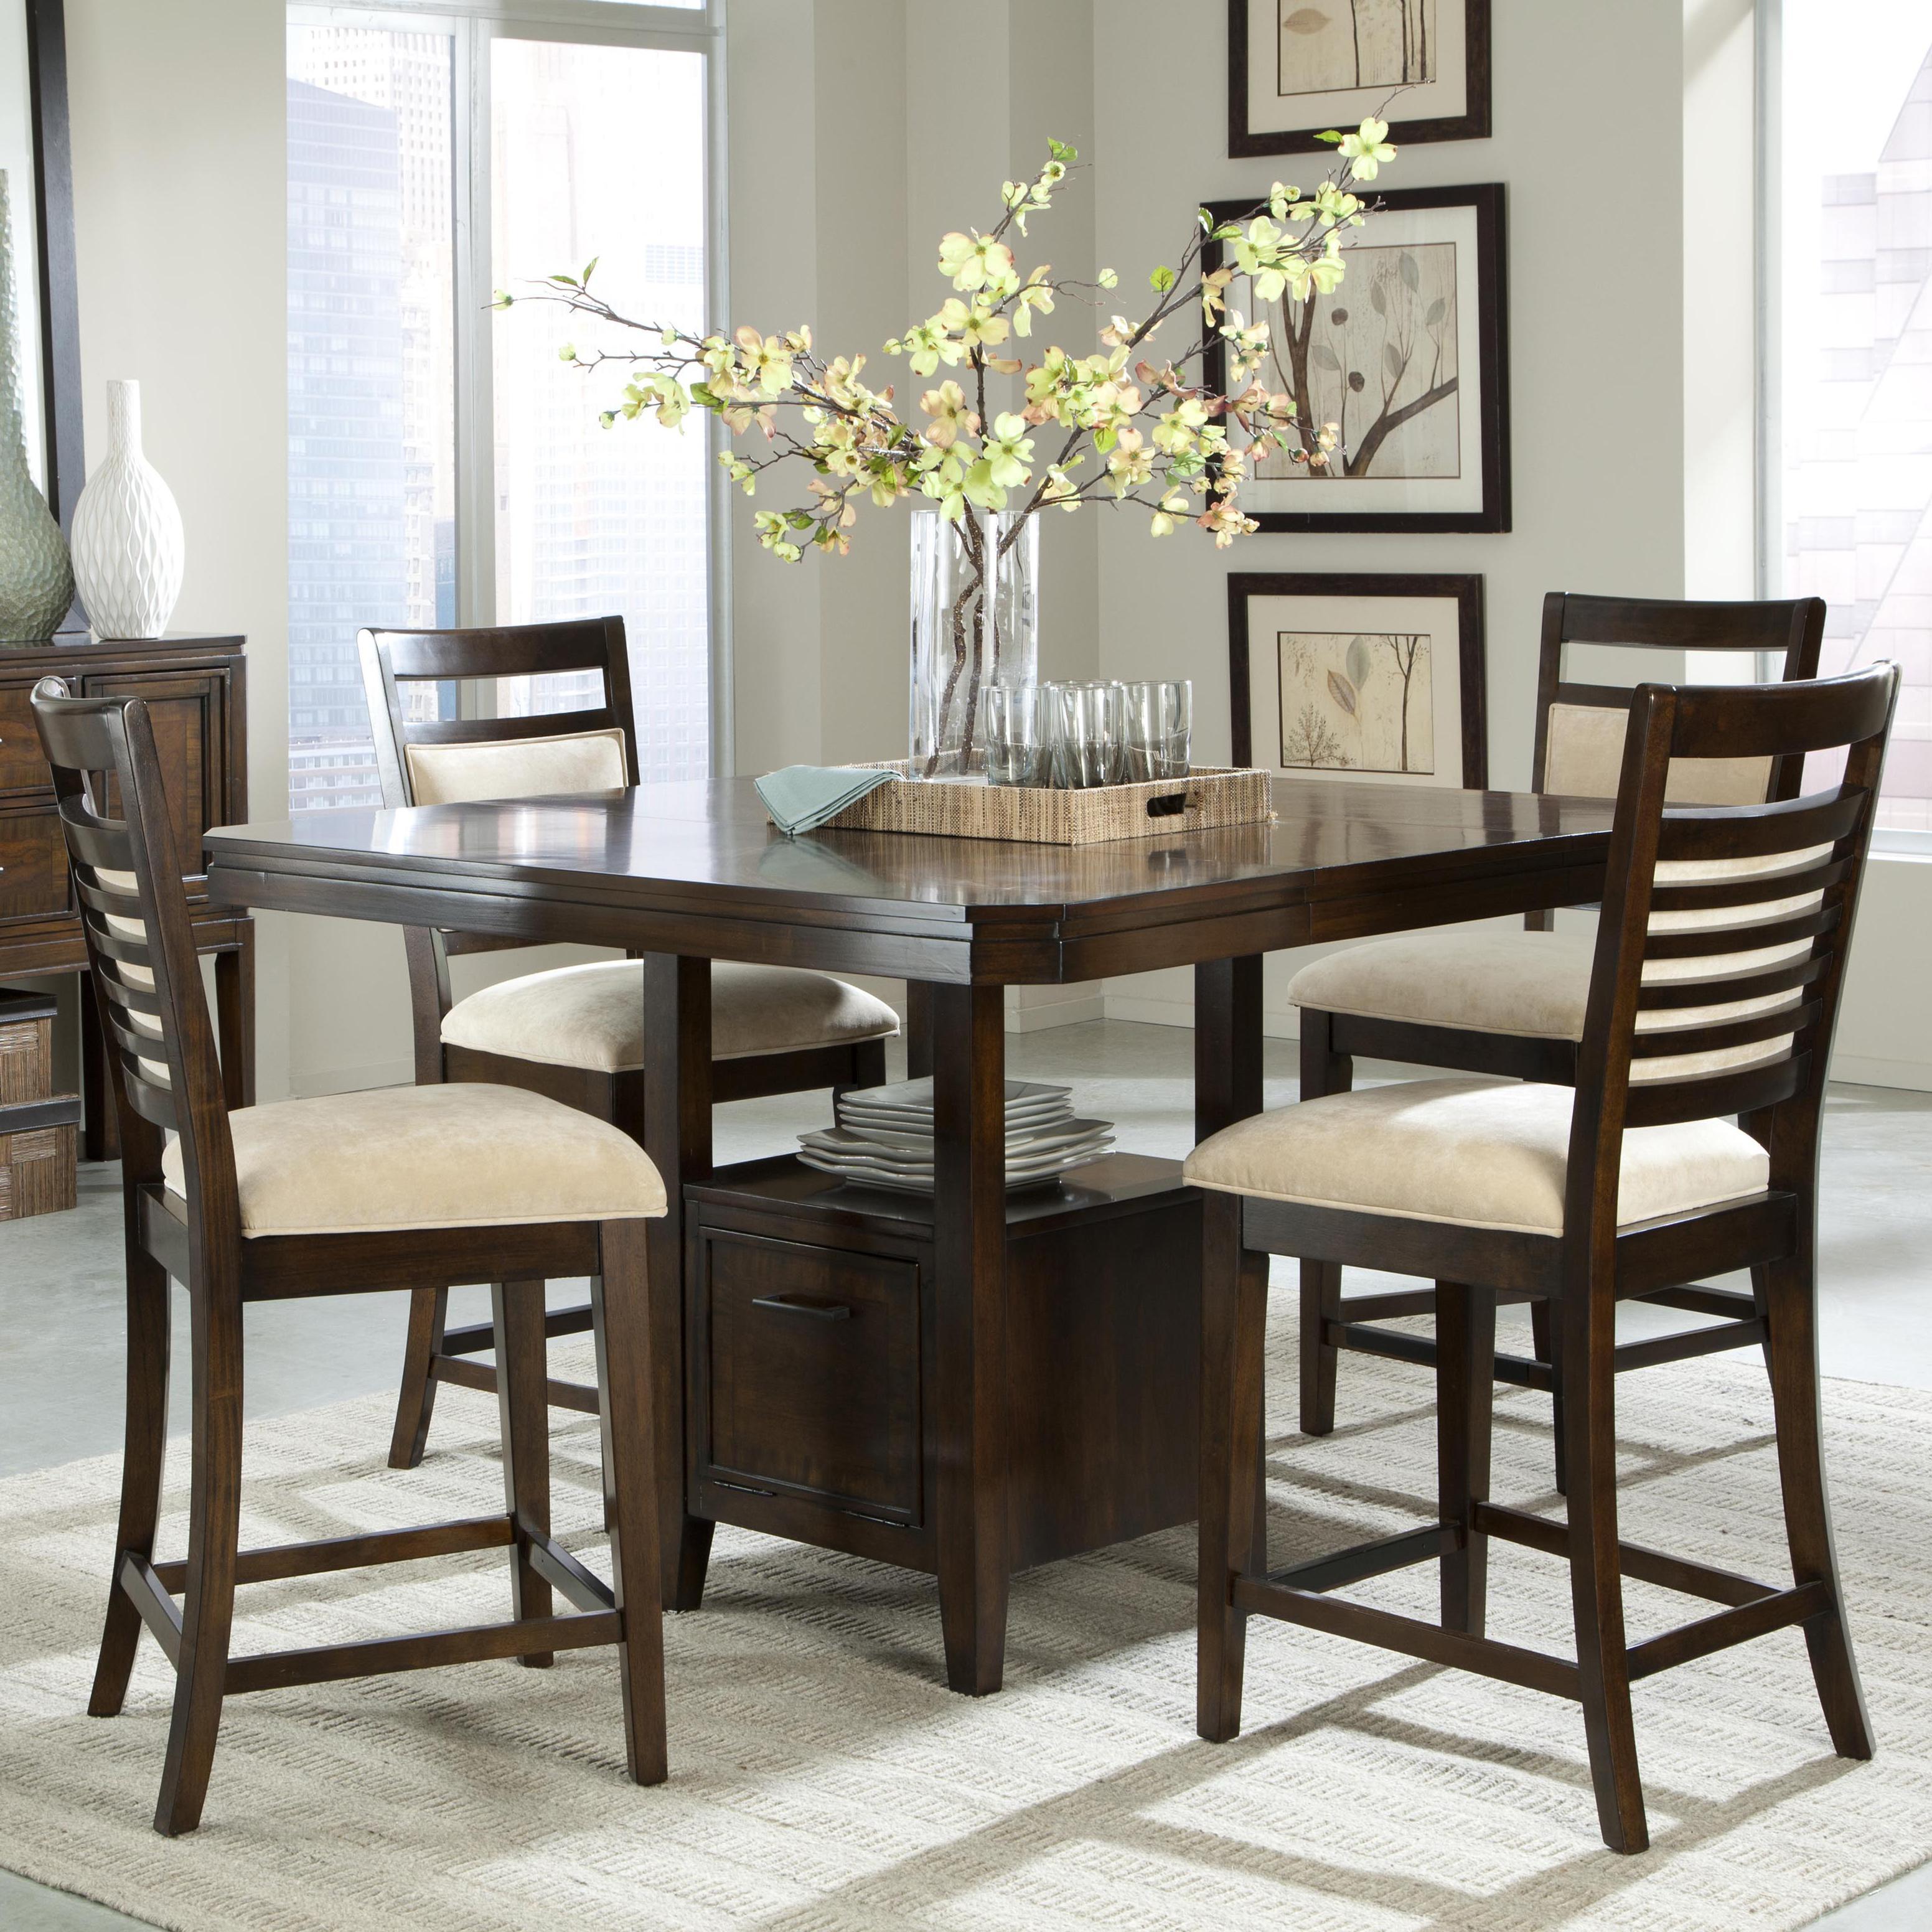 Standard Sofa Table Height Amazing Coffee Table Coffee